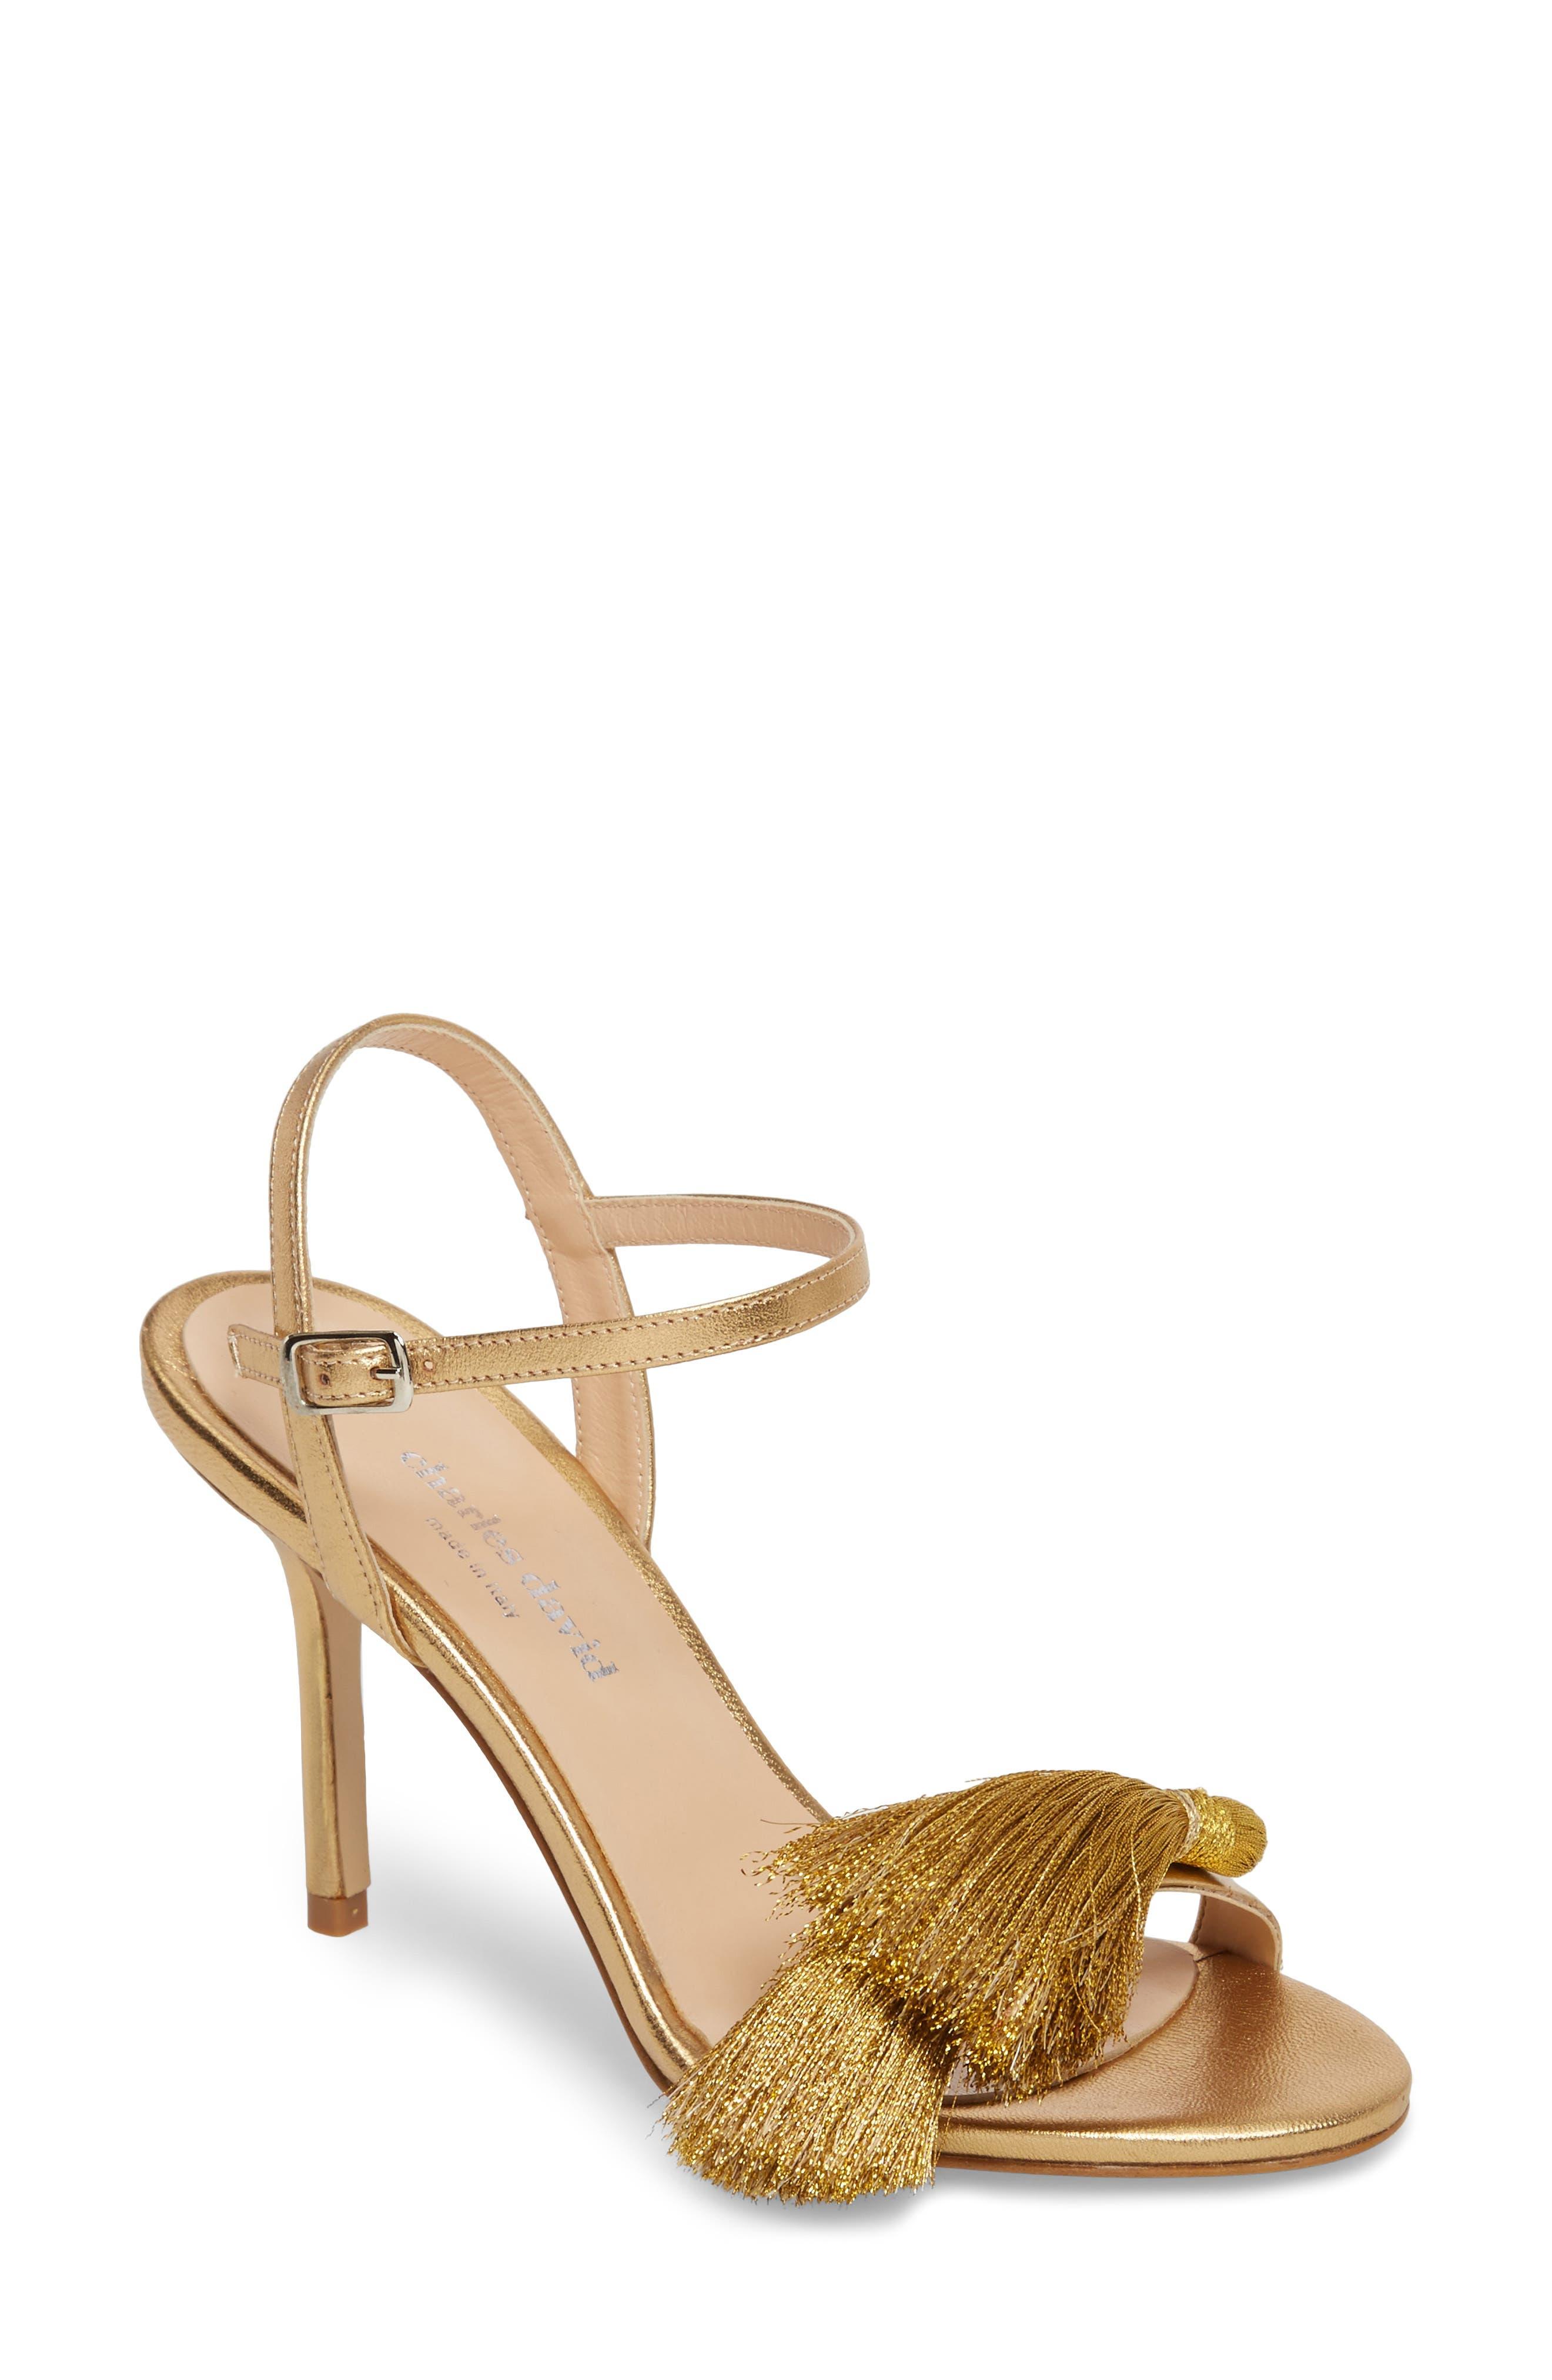 Sassy Tassel Sandal,                             Main thumbnail 1, color,                             Gold Leather